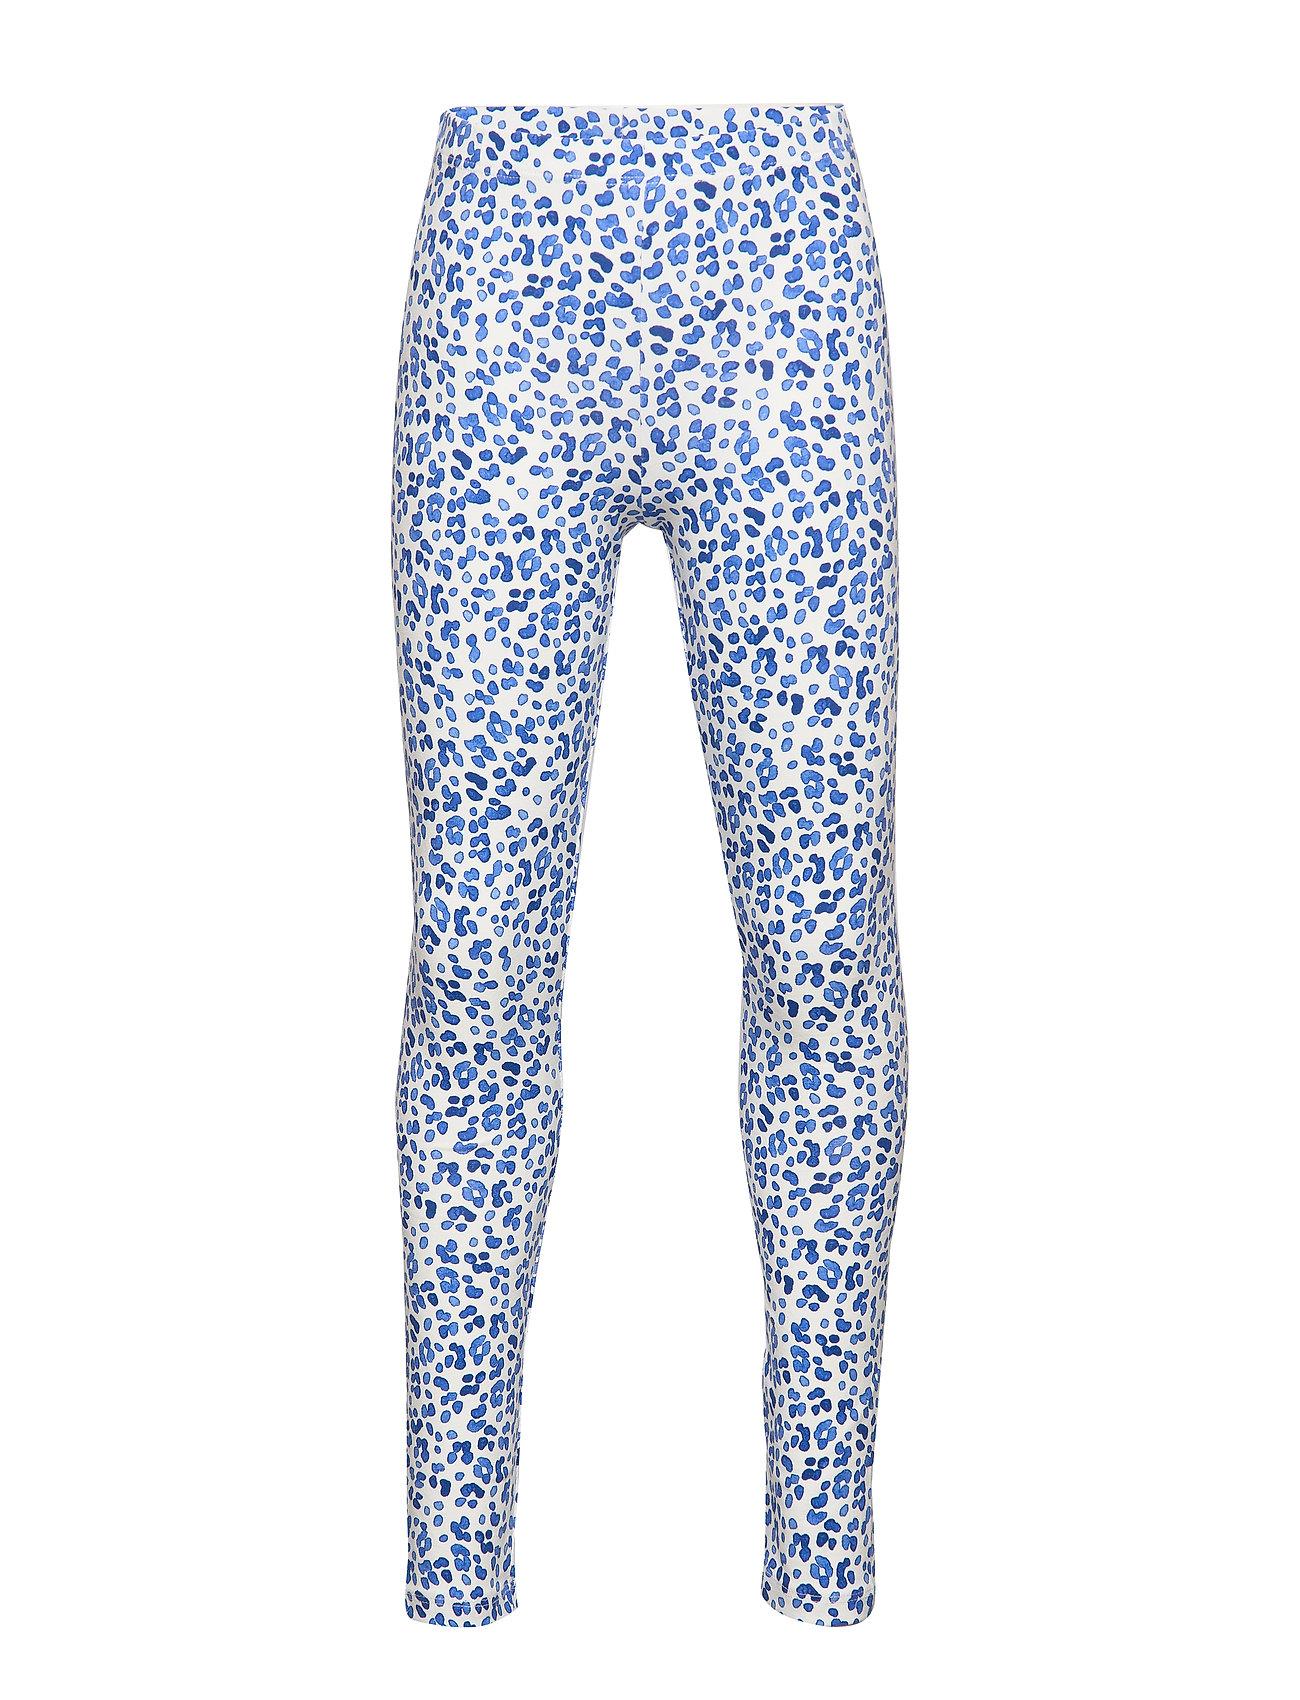 Gina Tricot Mini leggings - LEO BLUE (5533)